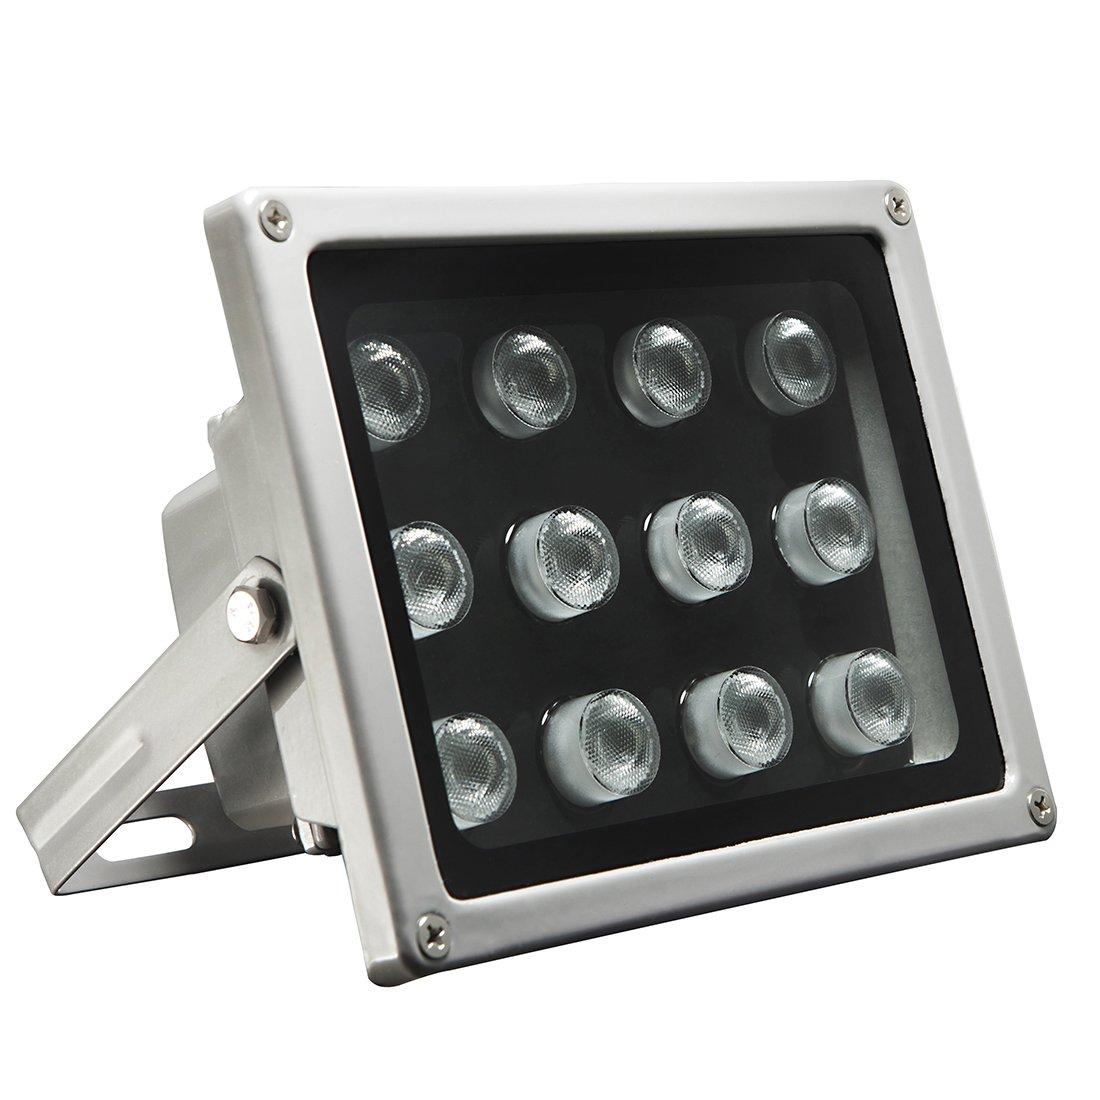 Univivi IR Illuminator,850nm 12 LEDs Wide Angle IR Illuminator for Night Vision,Waterproof LED Infrared Light with 12V DC Power Adapter for IP Camera, CCTV Security Camera